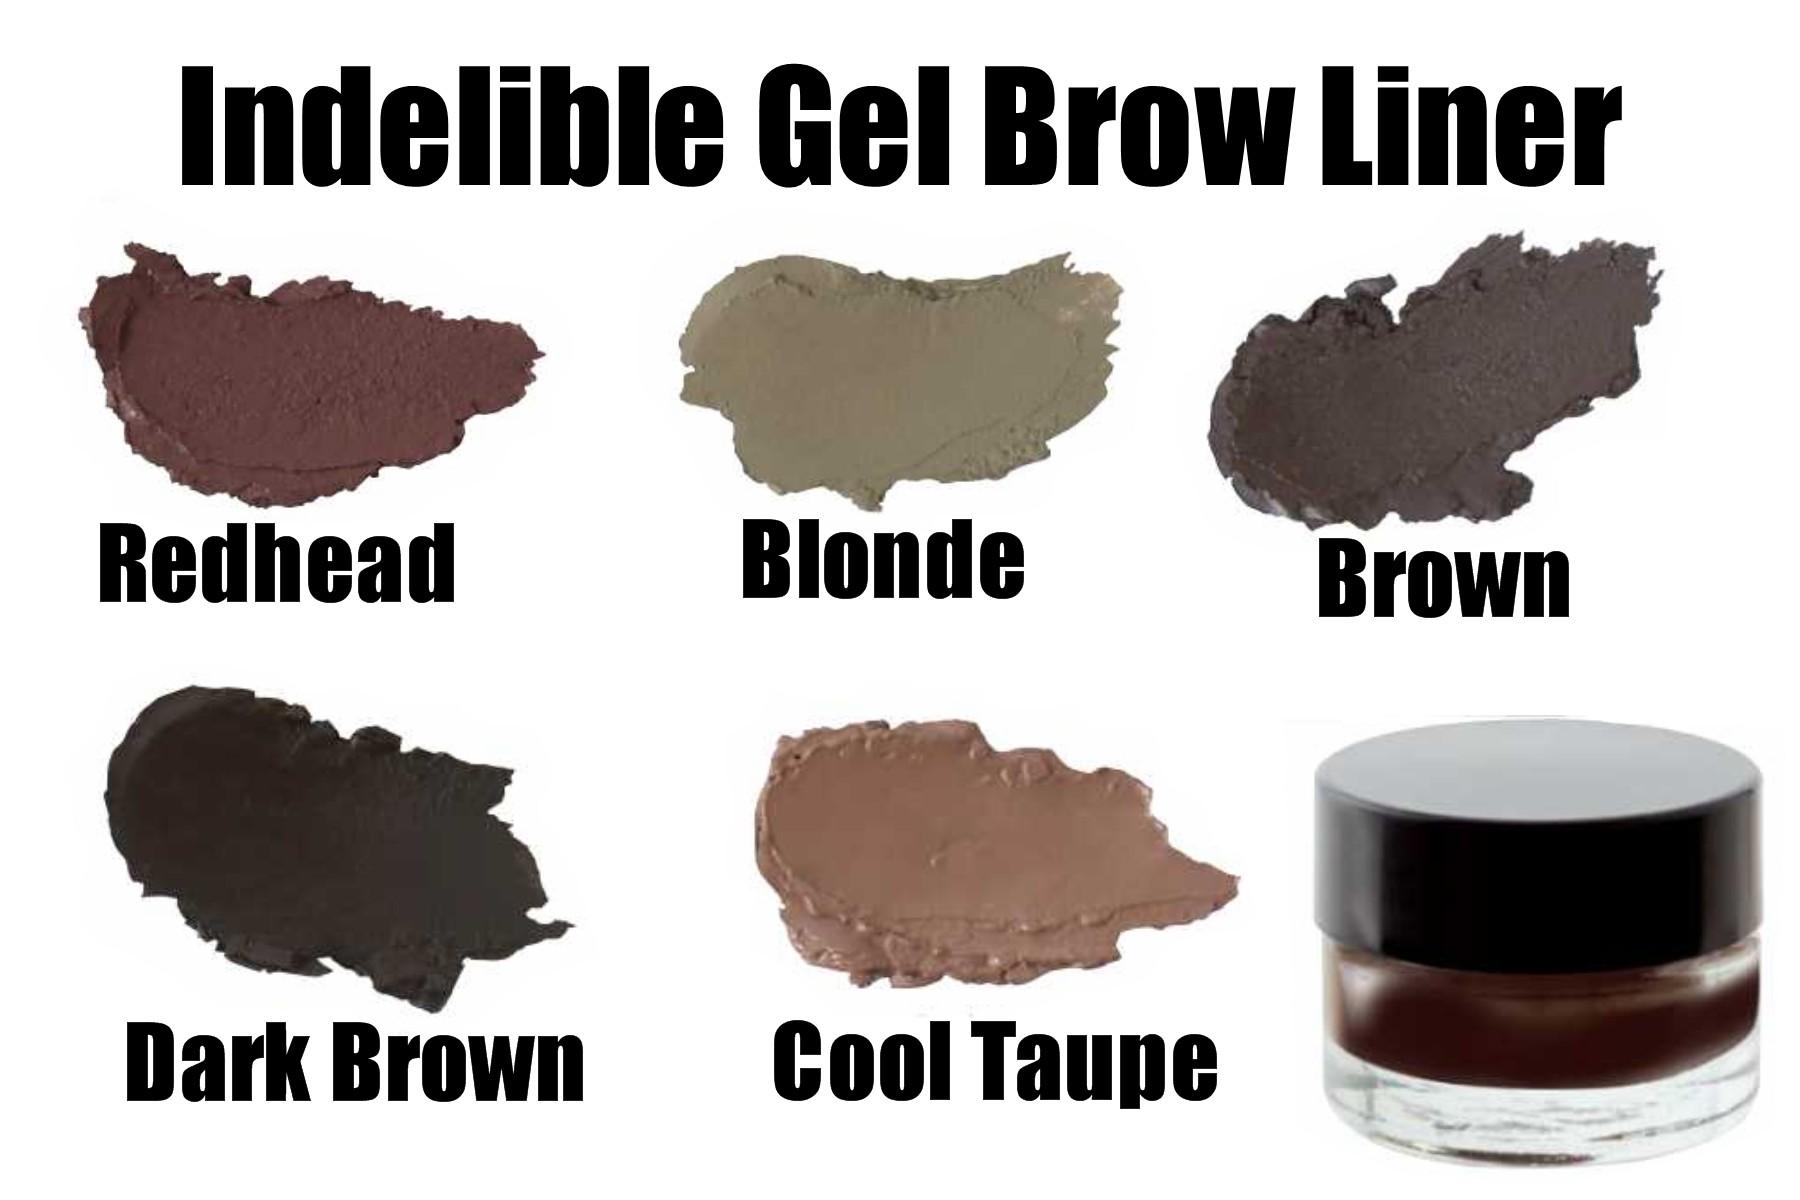 Pre-Order Indelible Gel Brow Liner